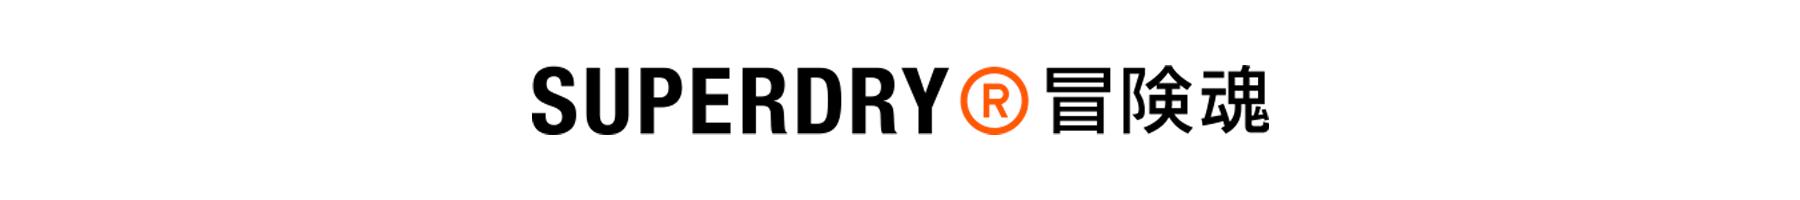 DrJays.com - Superdry